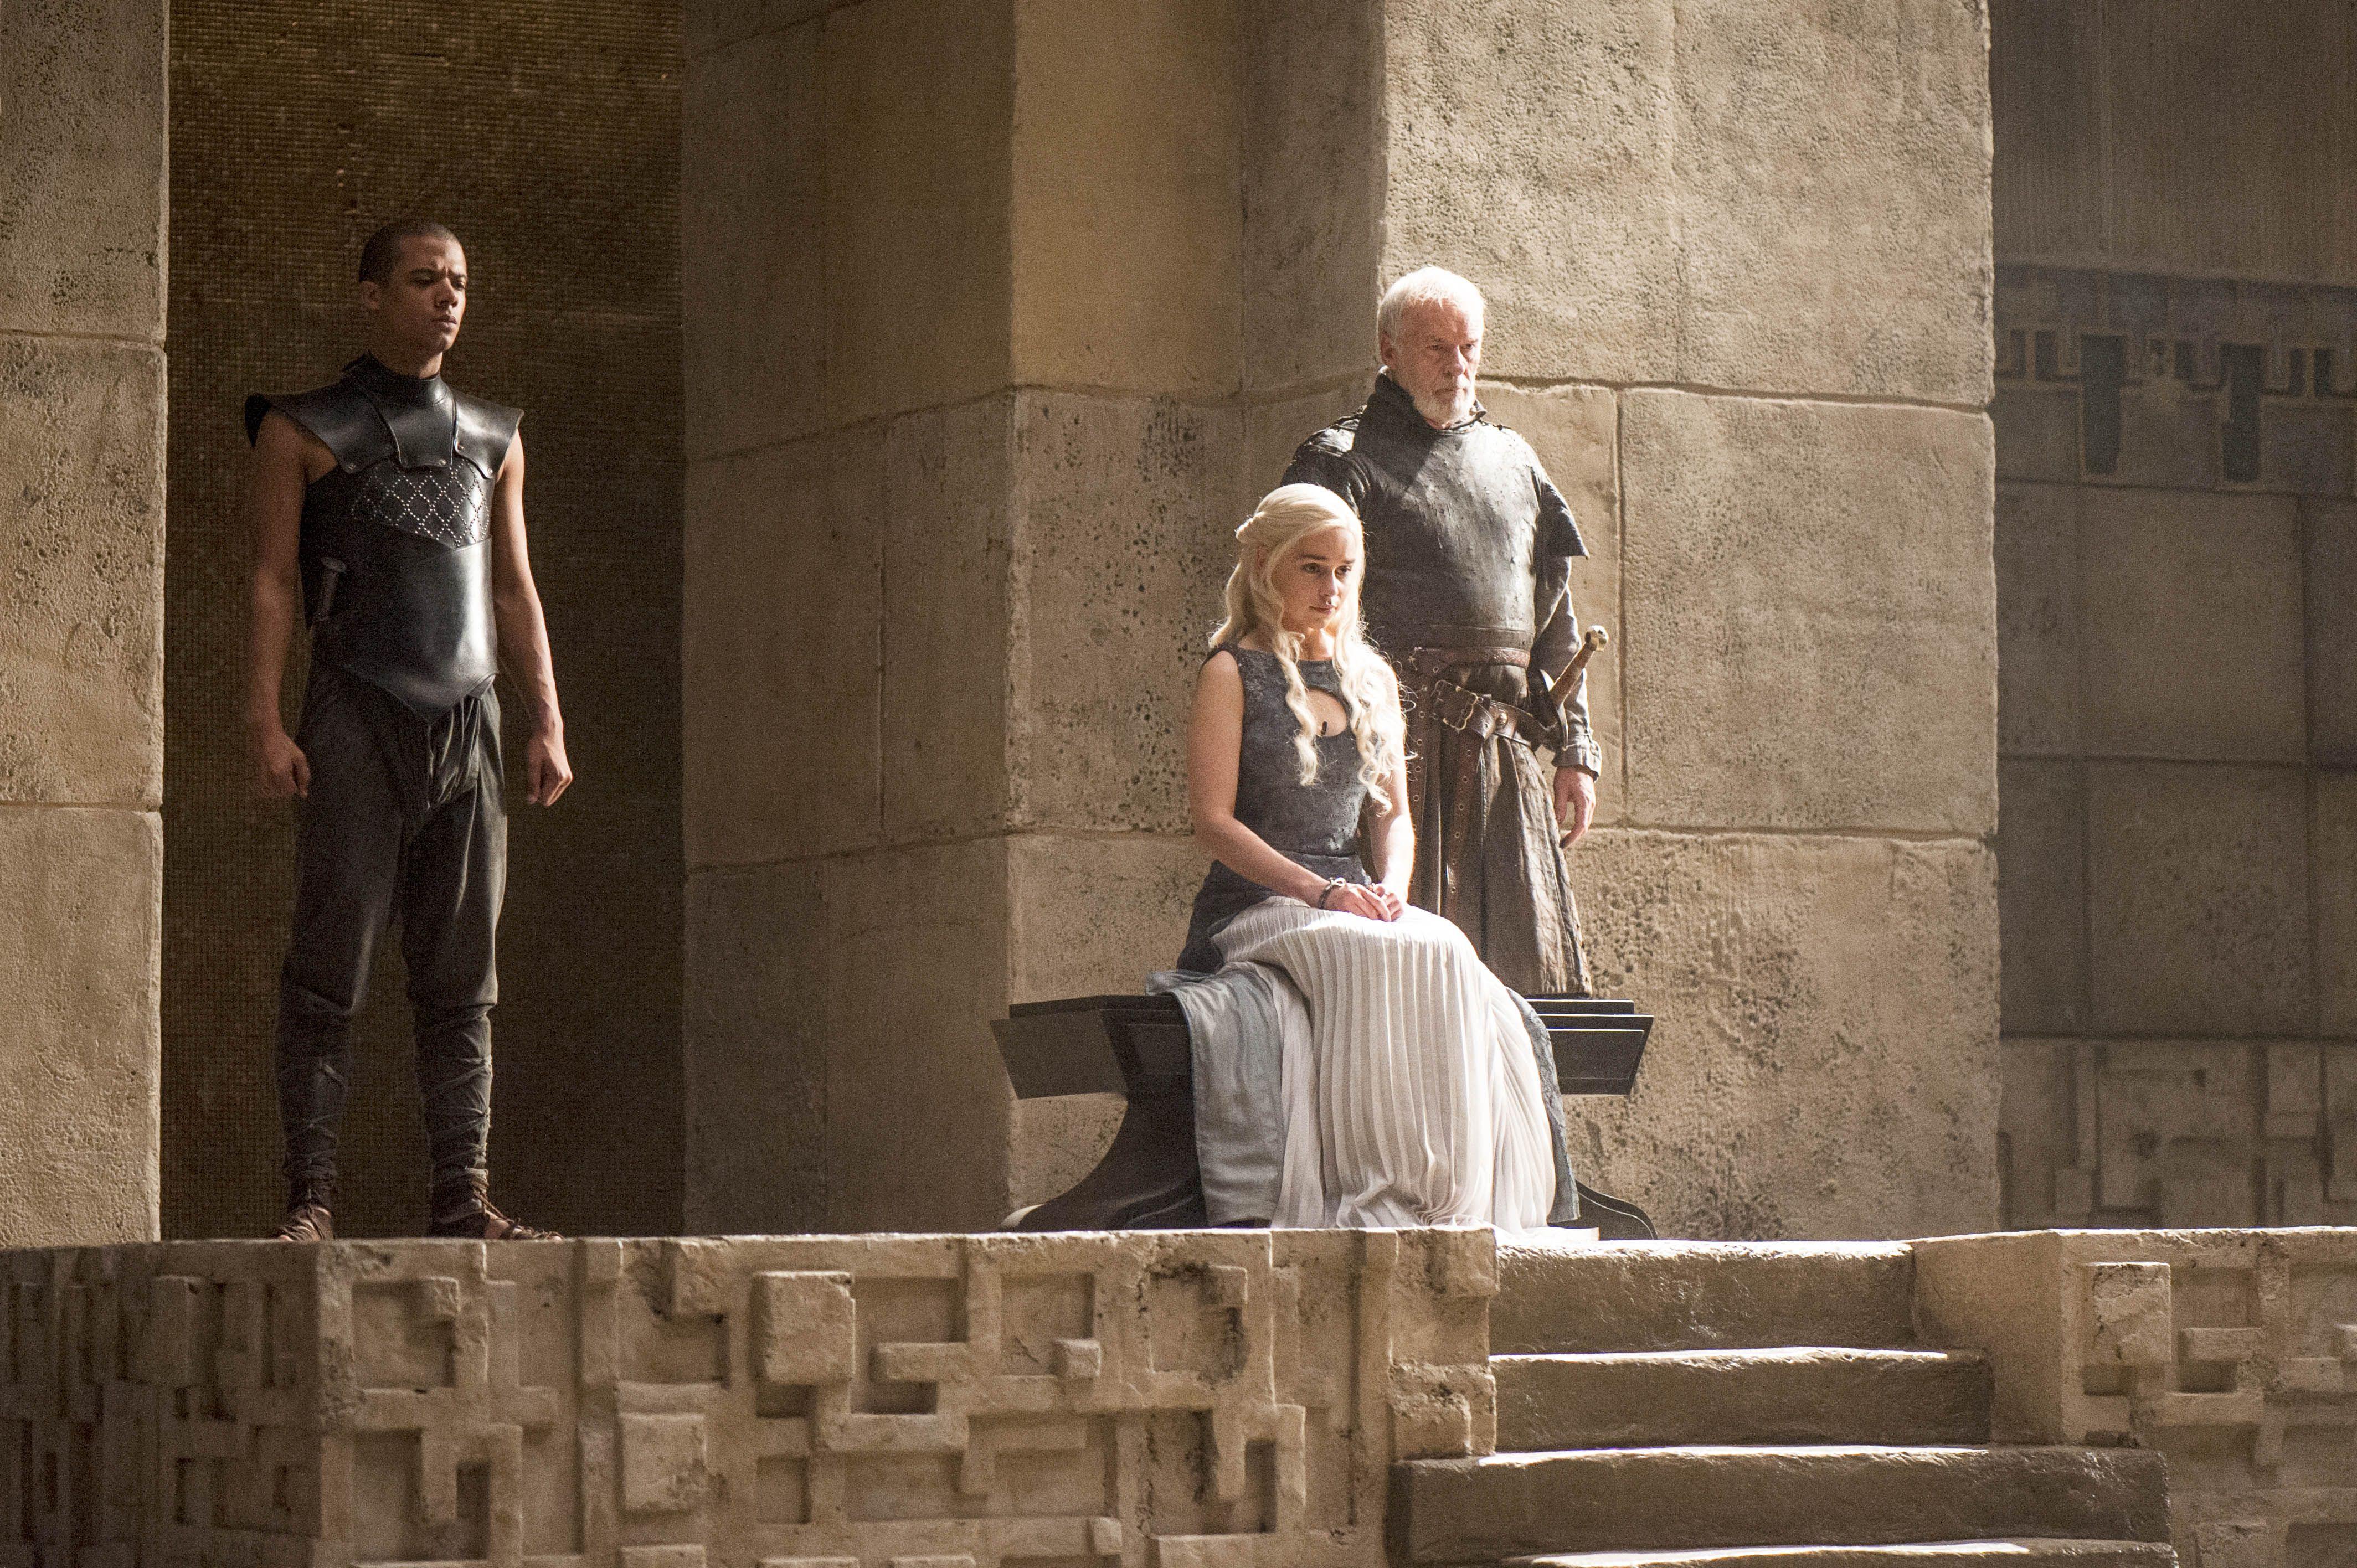 Game of Thrones Season 4 Episode 10 Still Emilia